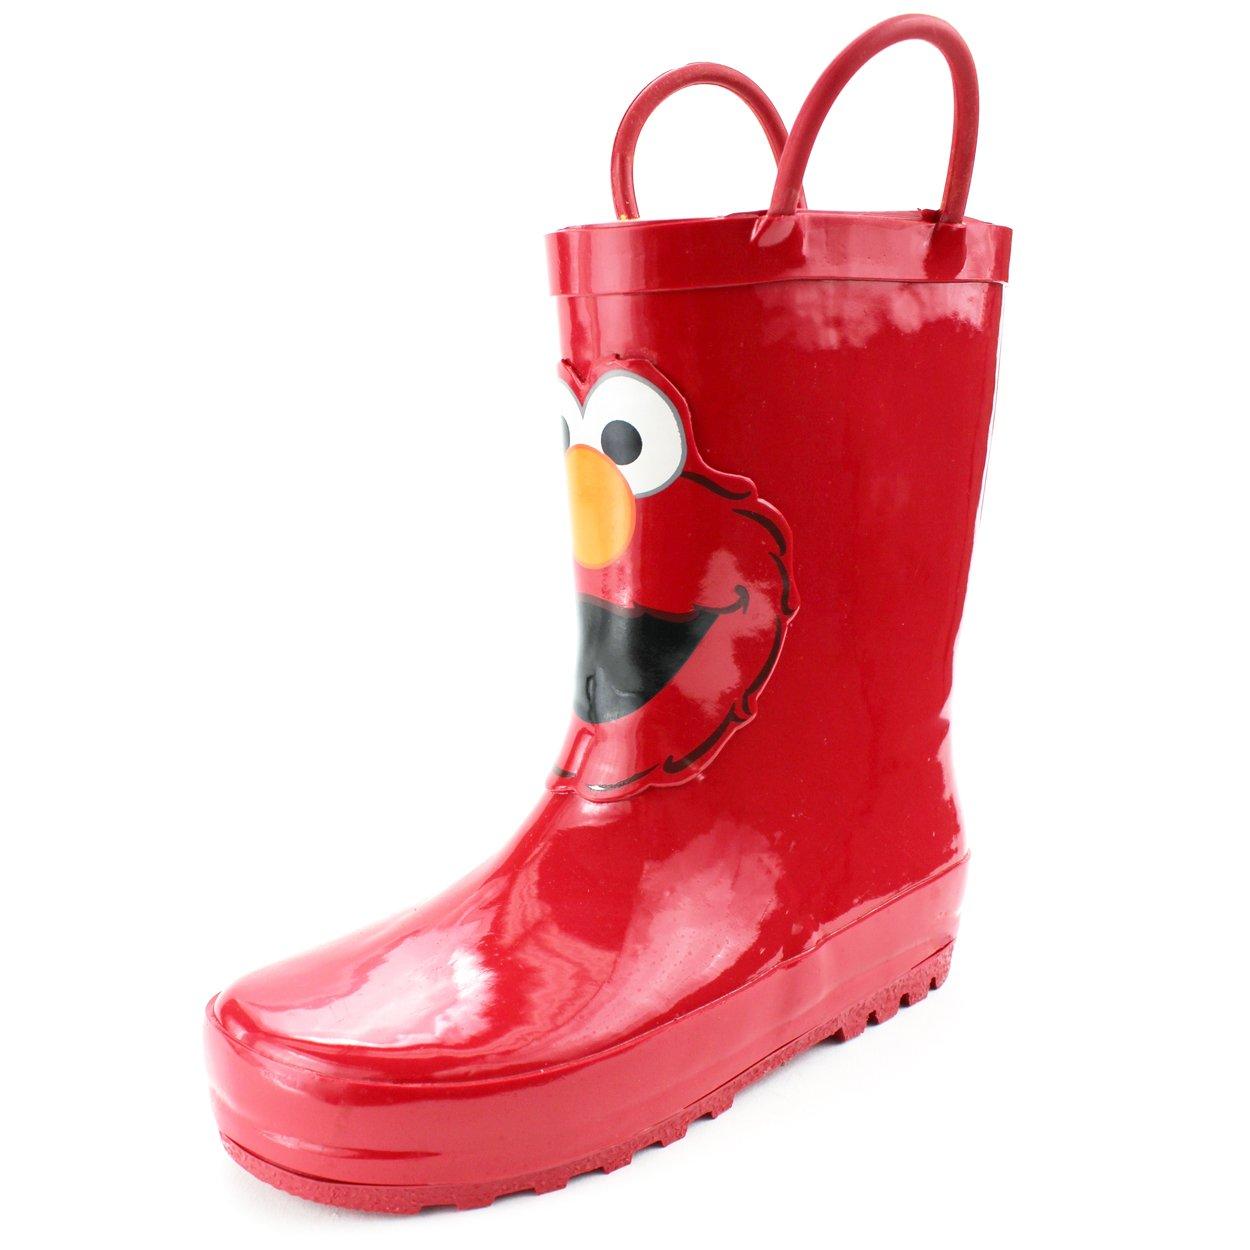 Sesame Street Elmo Boys Girls Rain Boots (Toddler/Little Kid) manufacturer